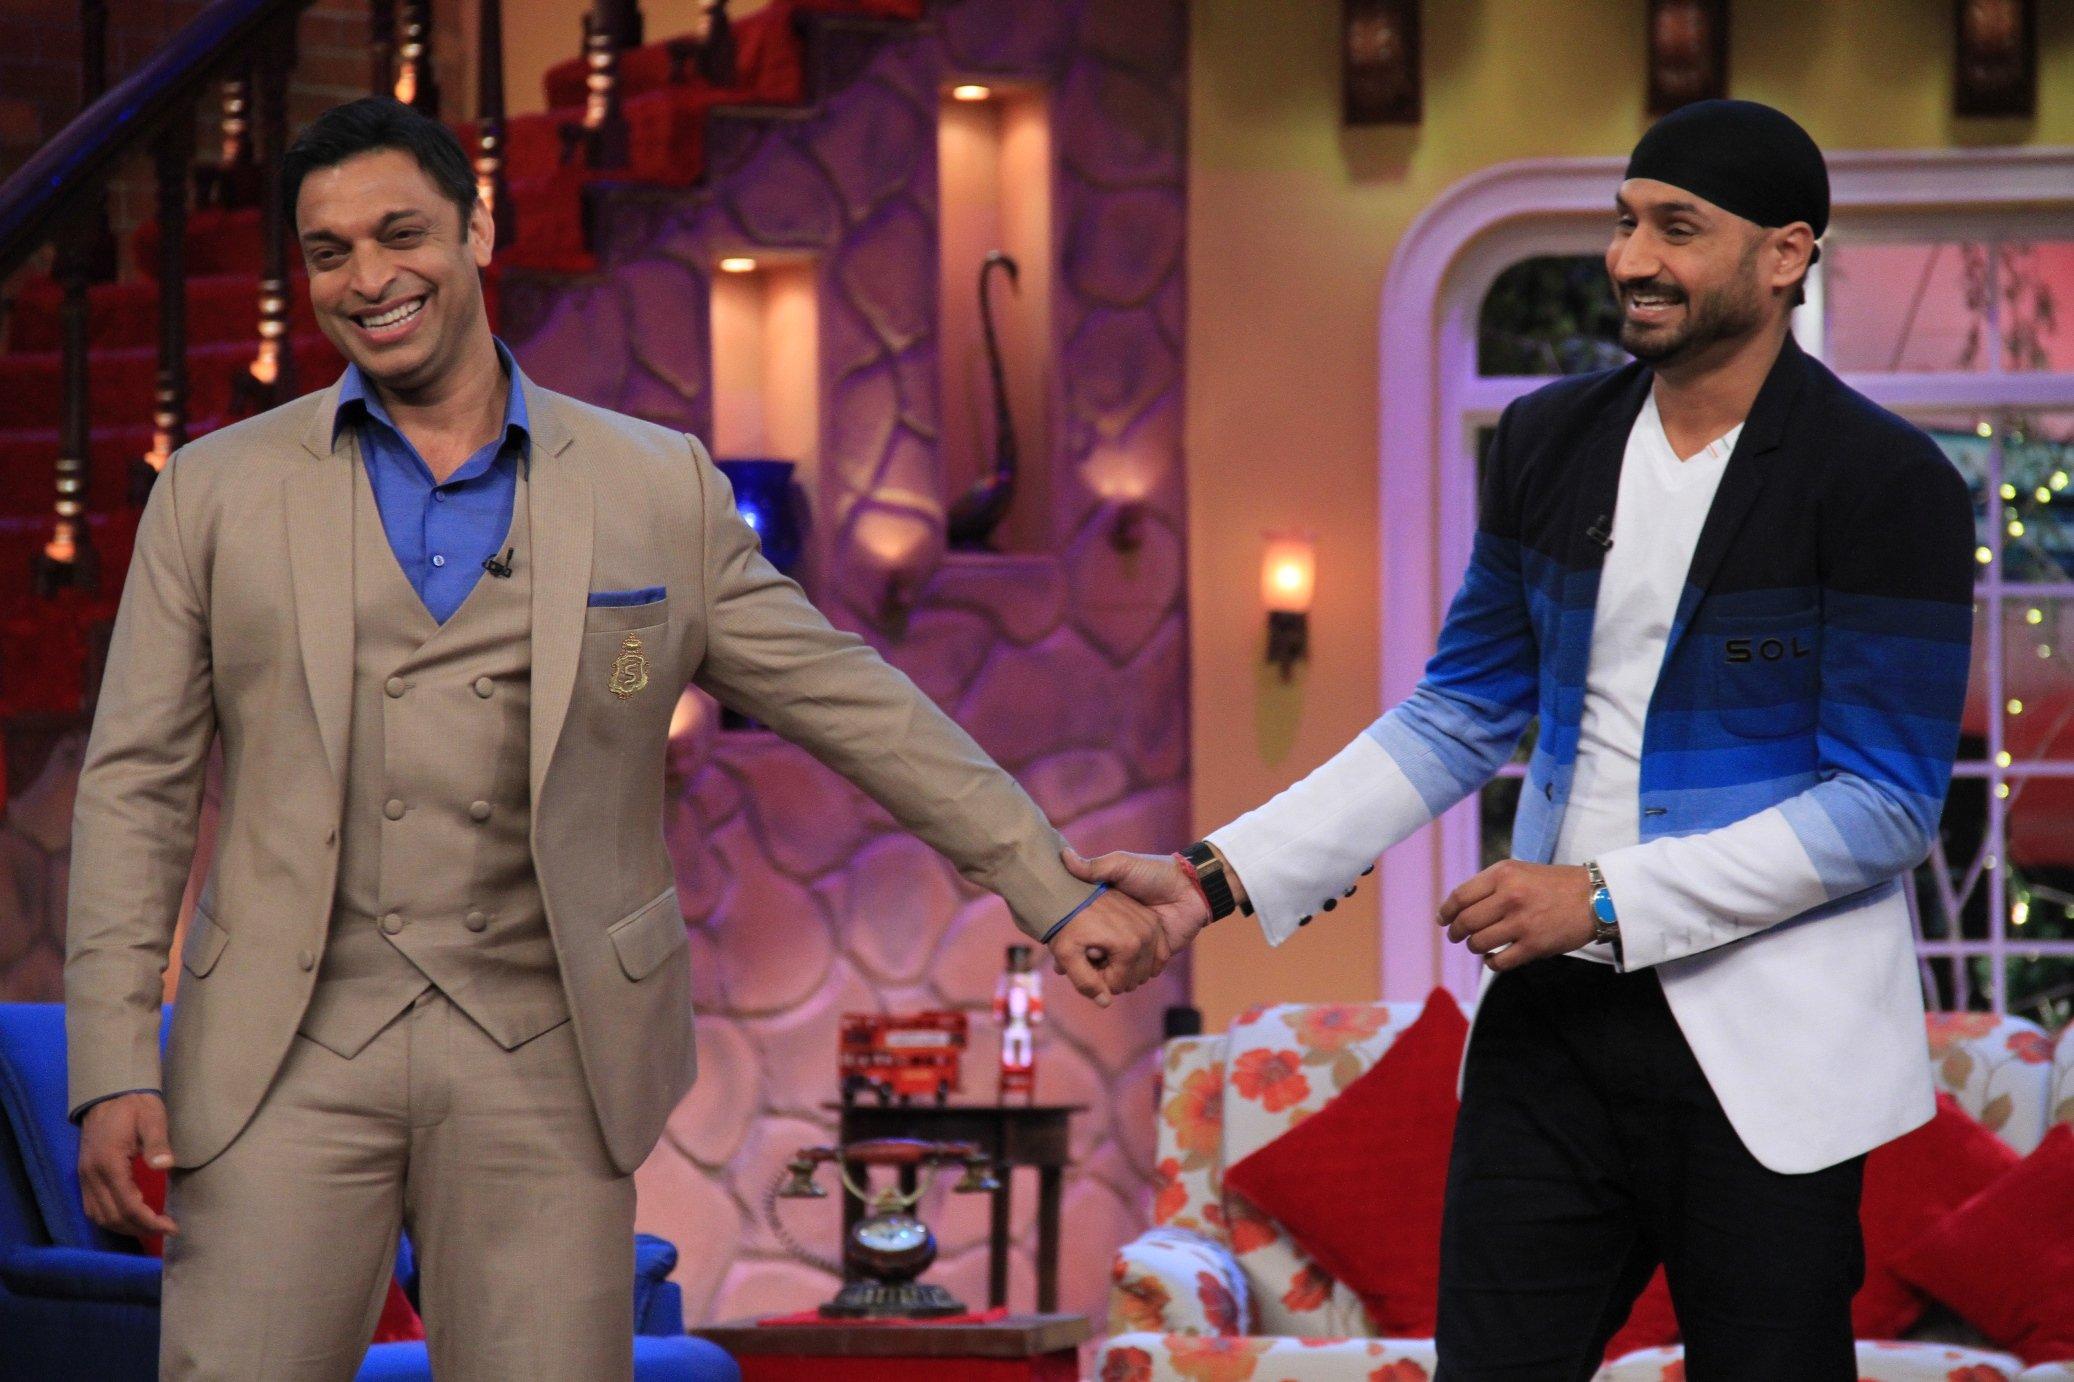 Shoaib Akhtar and Harbhajan Singh on Comedy Nights with Kapil PHOTO: getmovieinfo.com